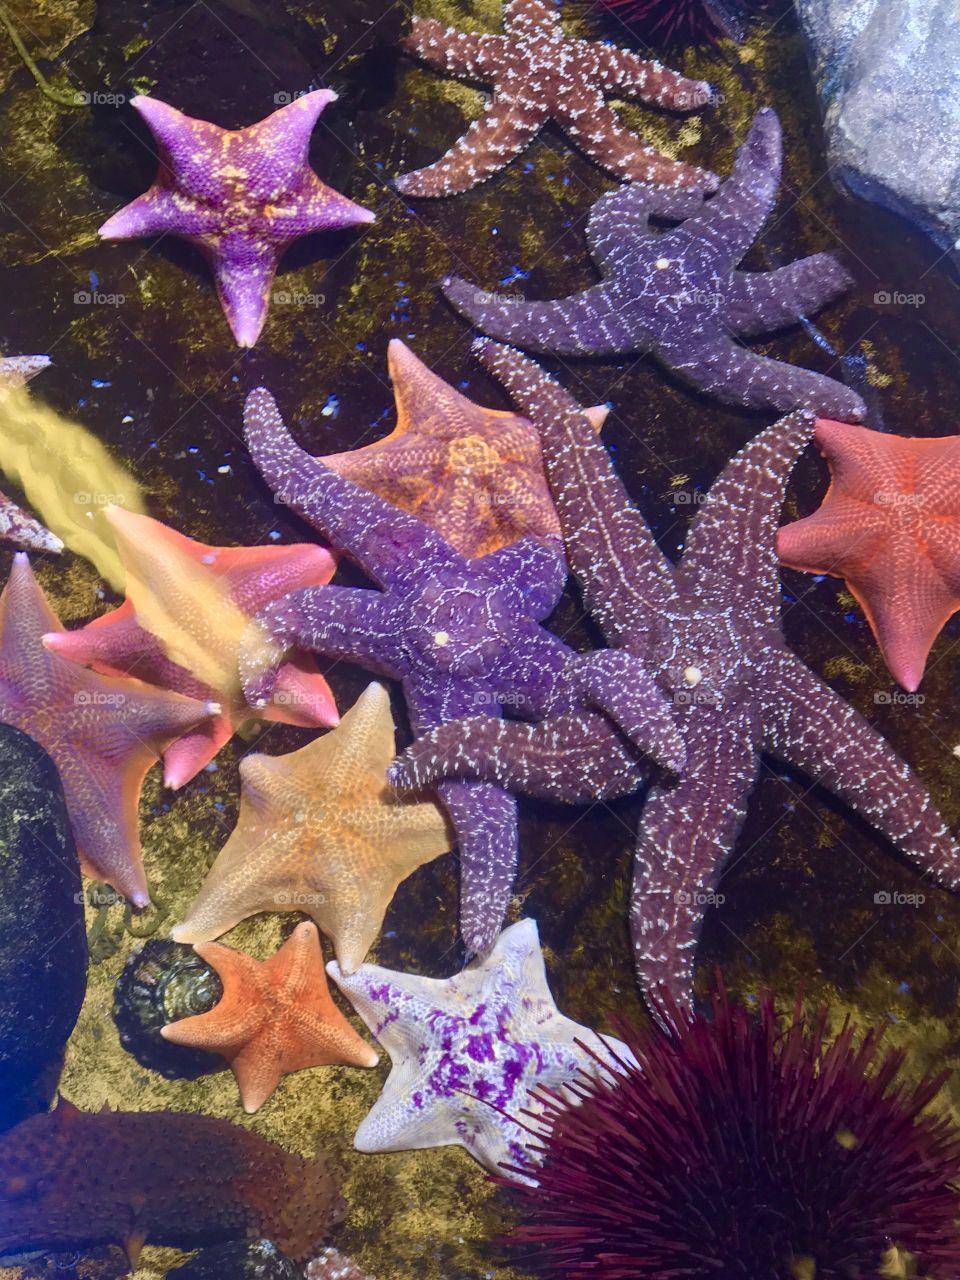 Starfish overload